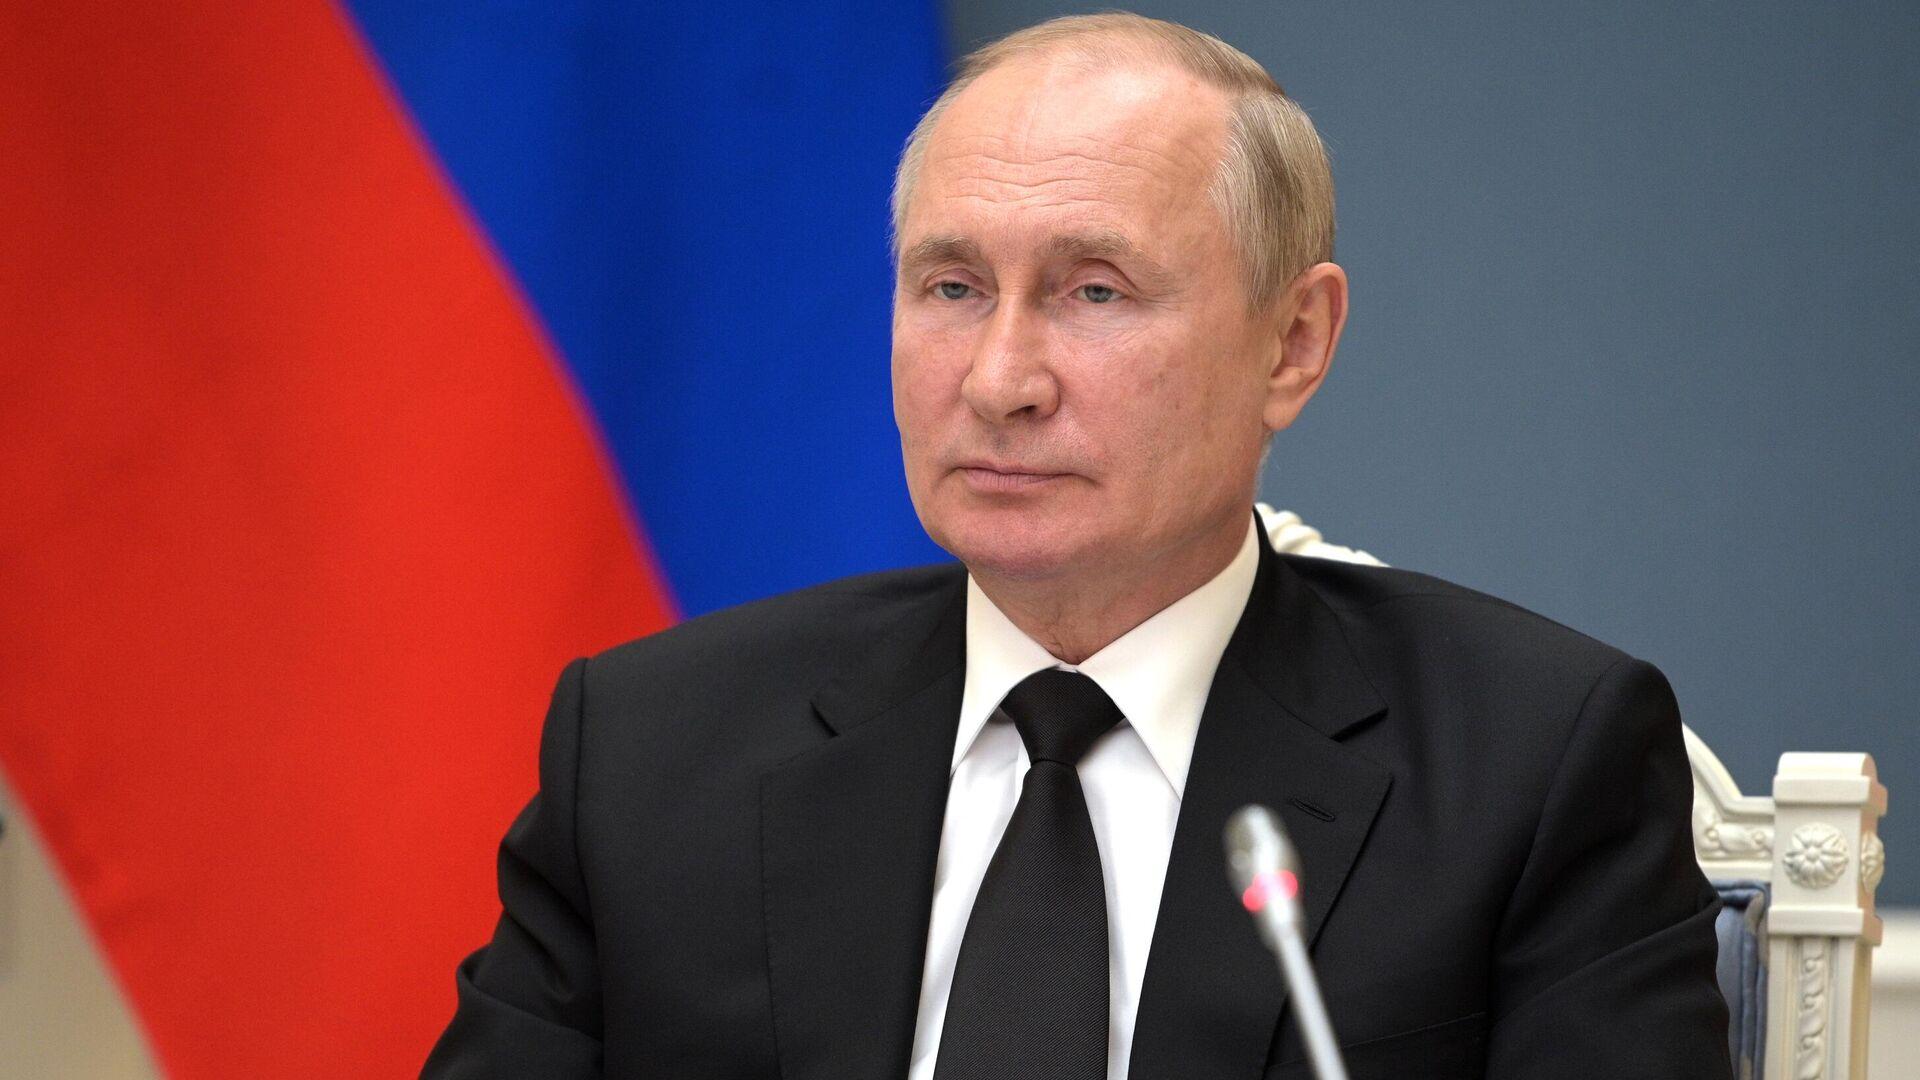 Президент РФ Владимир Путин - Sputnik Беларусь, 1920, 13.10.2021